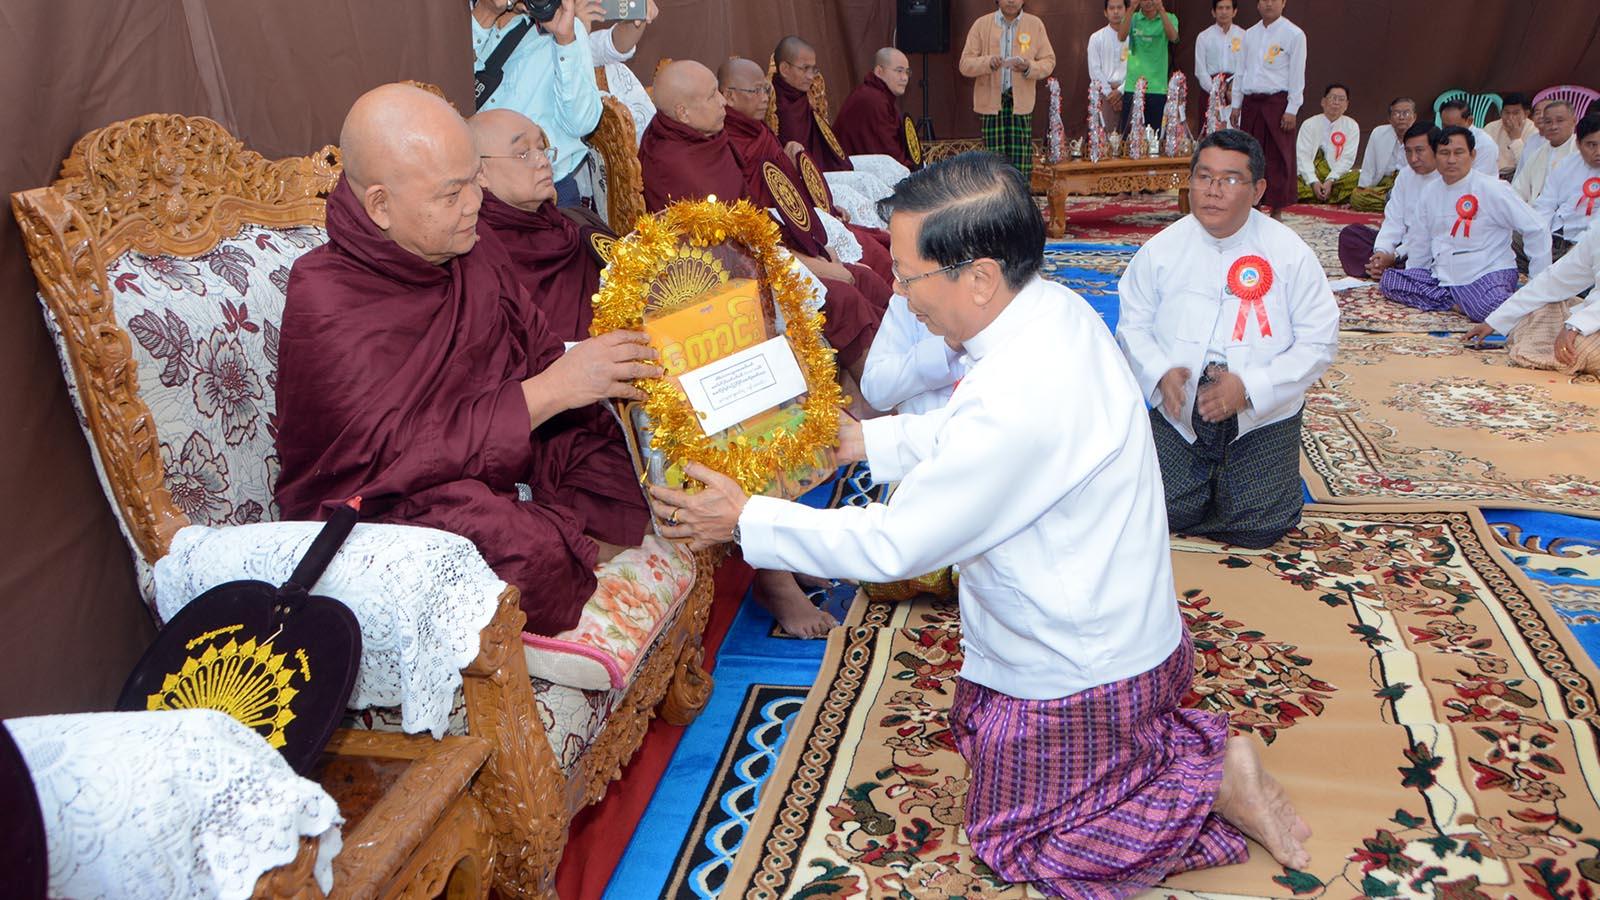 Union Minister Thura U Aung Ko donates the offertories to the Sangha at the inauguration ceremony for renovation of Thiri Minigalar Kaba Aye Pagoda in Yangon yesterday.Photo: MNA